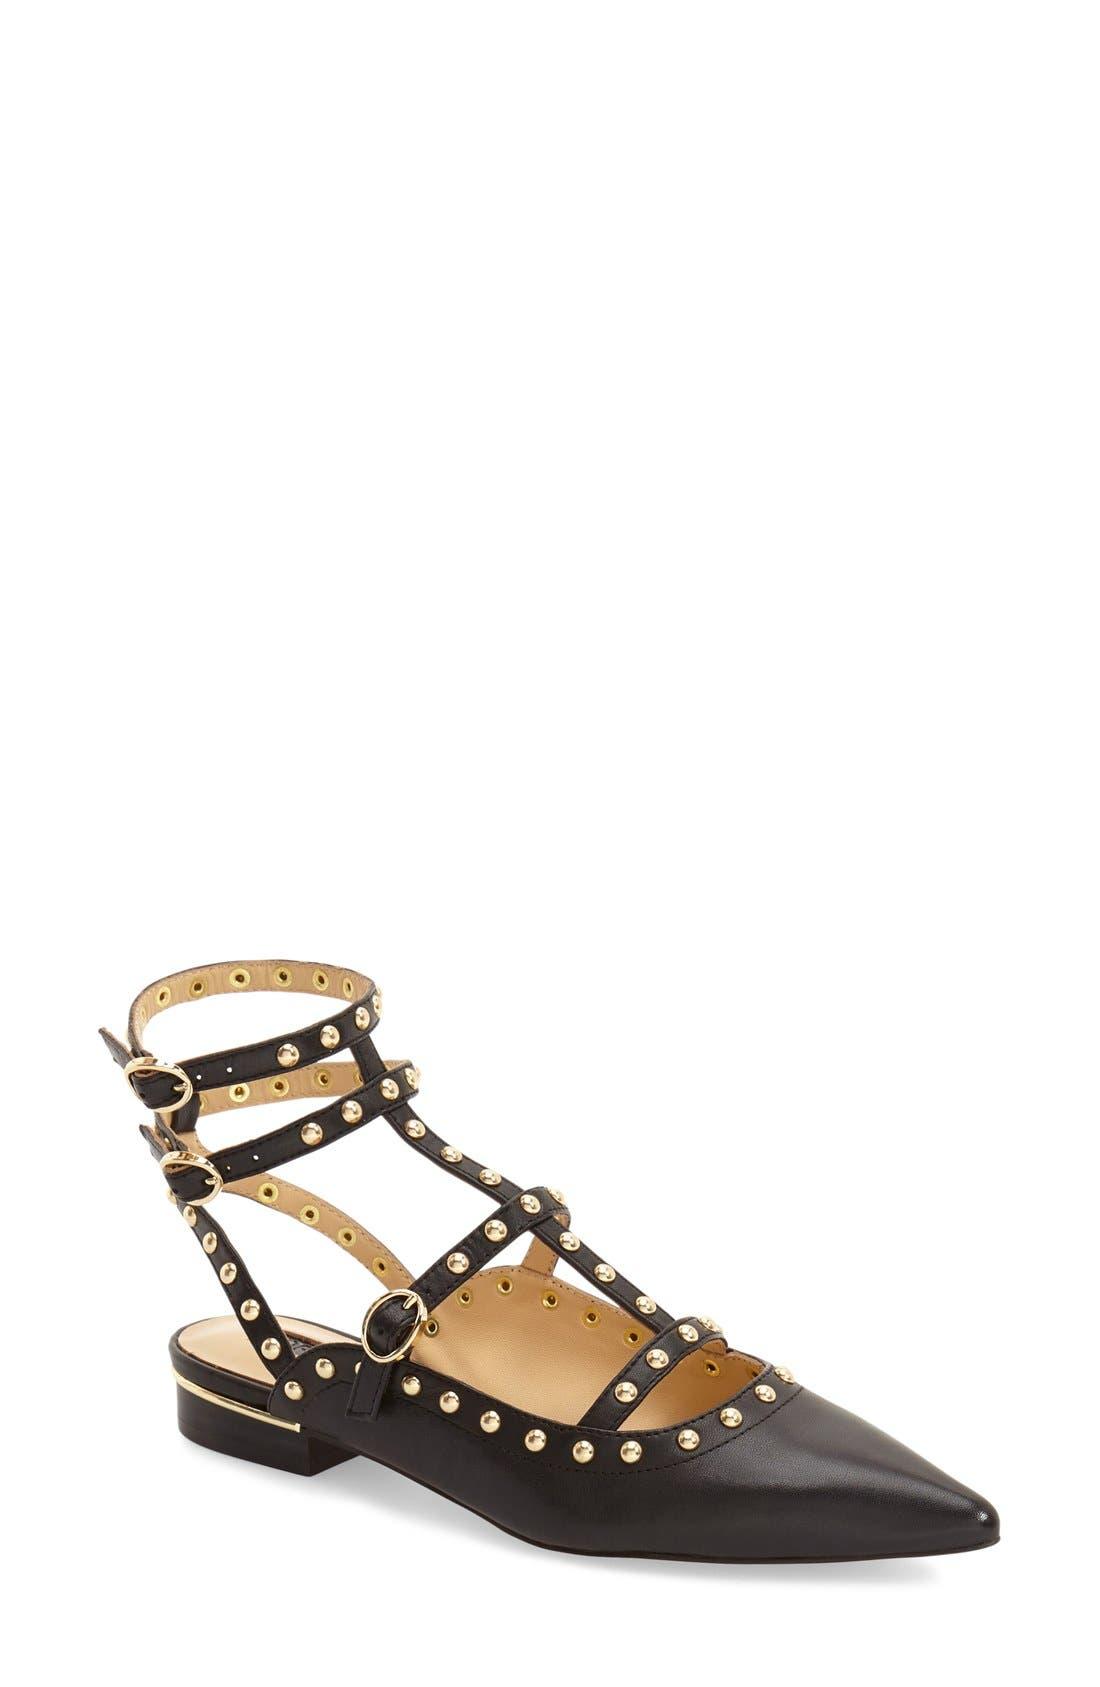 'Kate' Studded Cutout Sandal, Main, color, 001